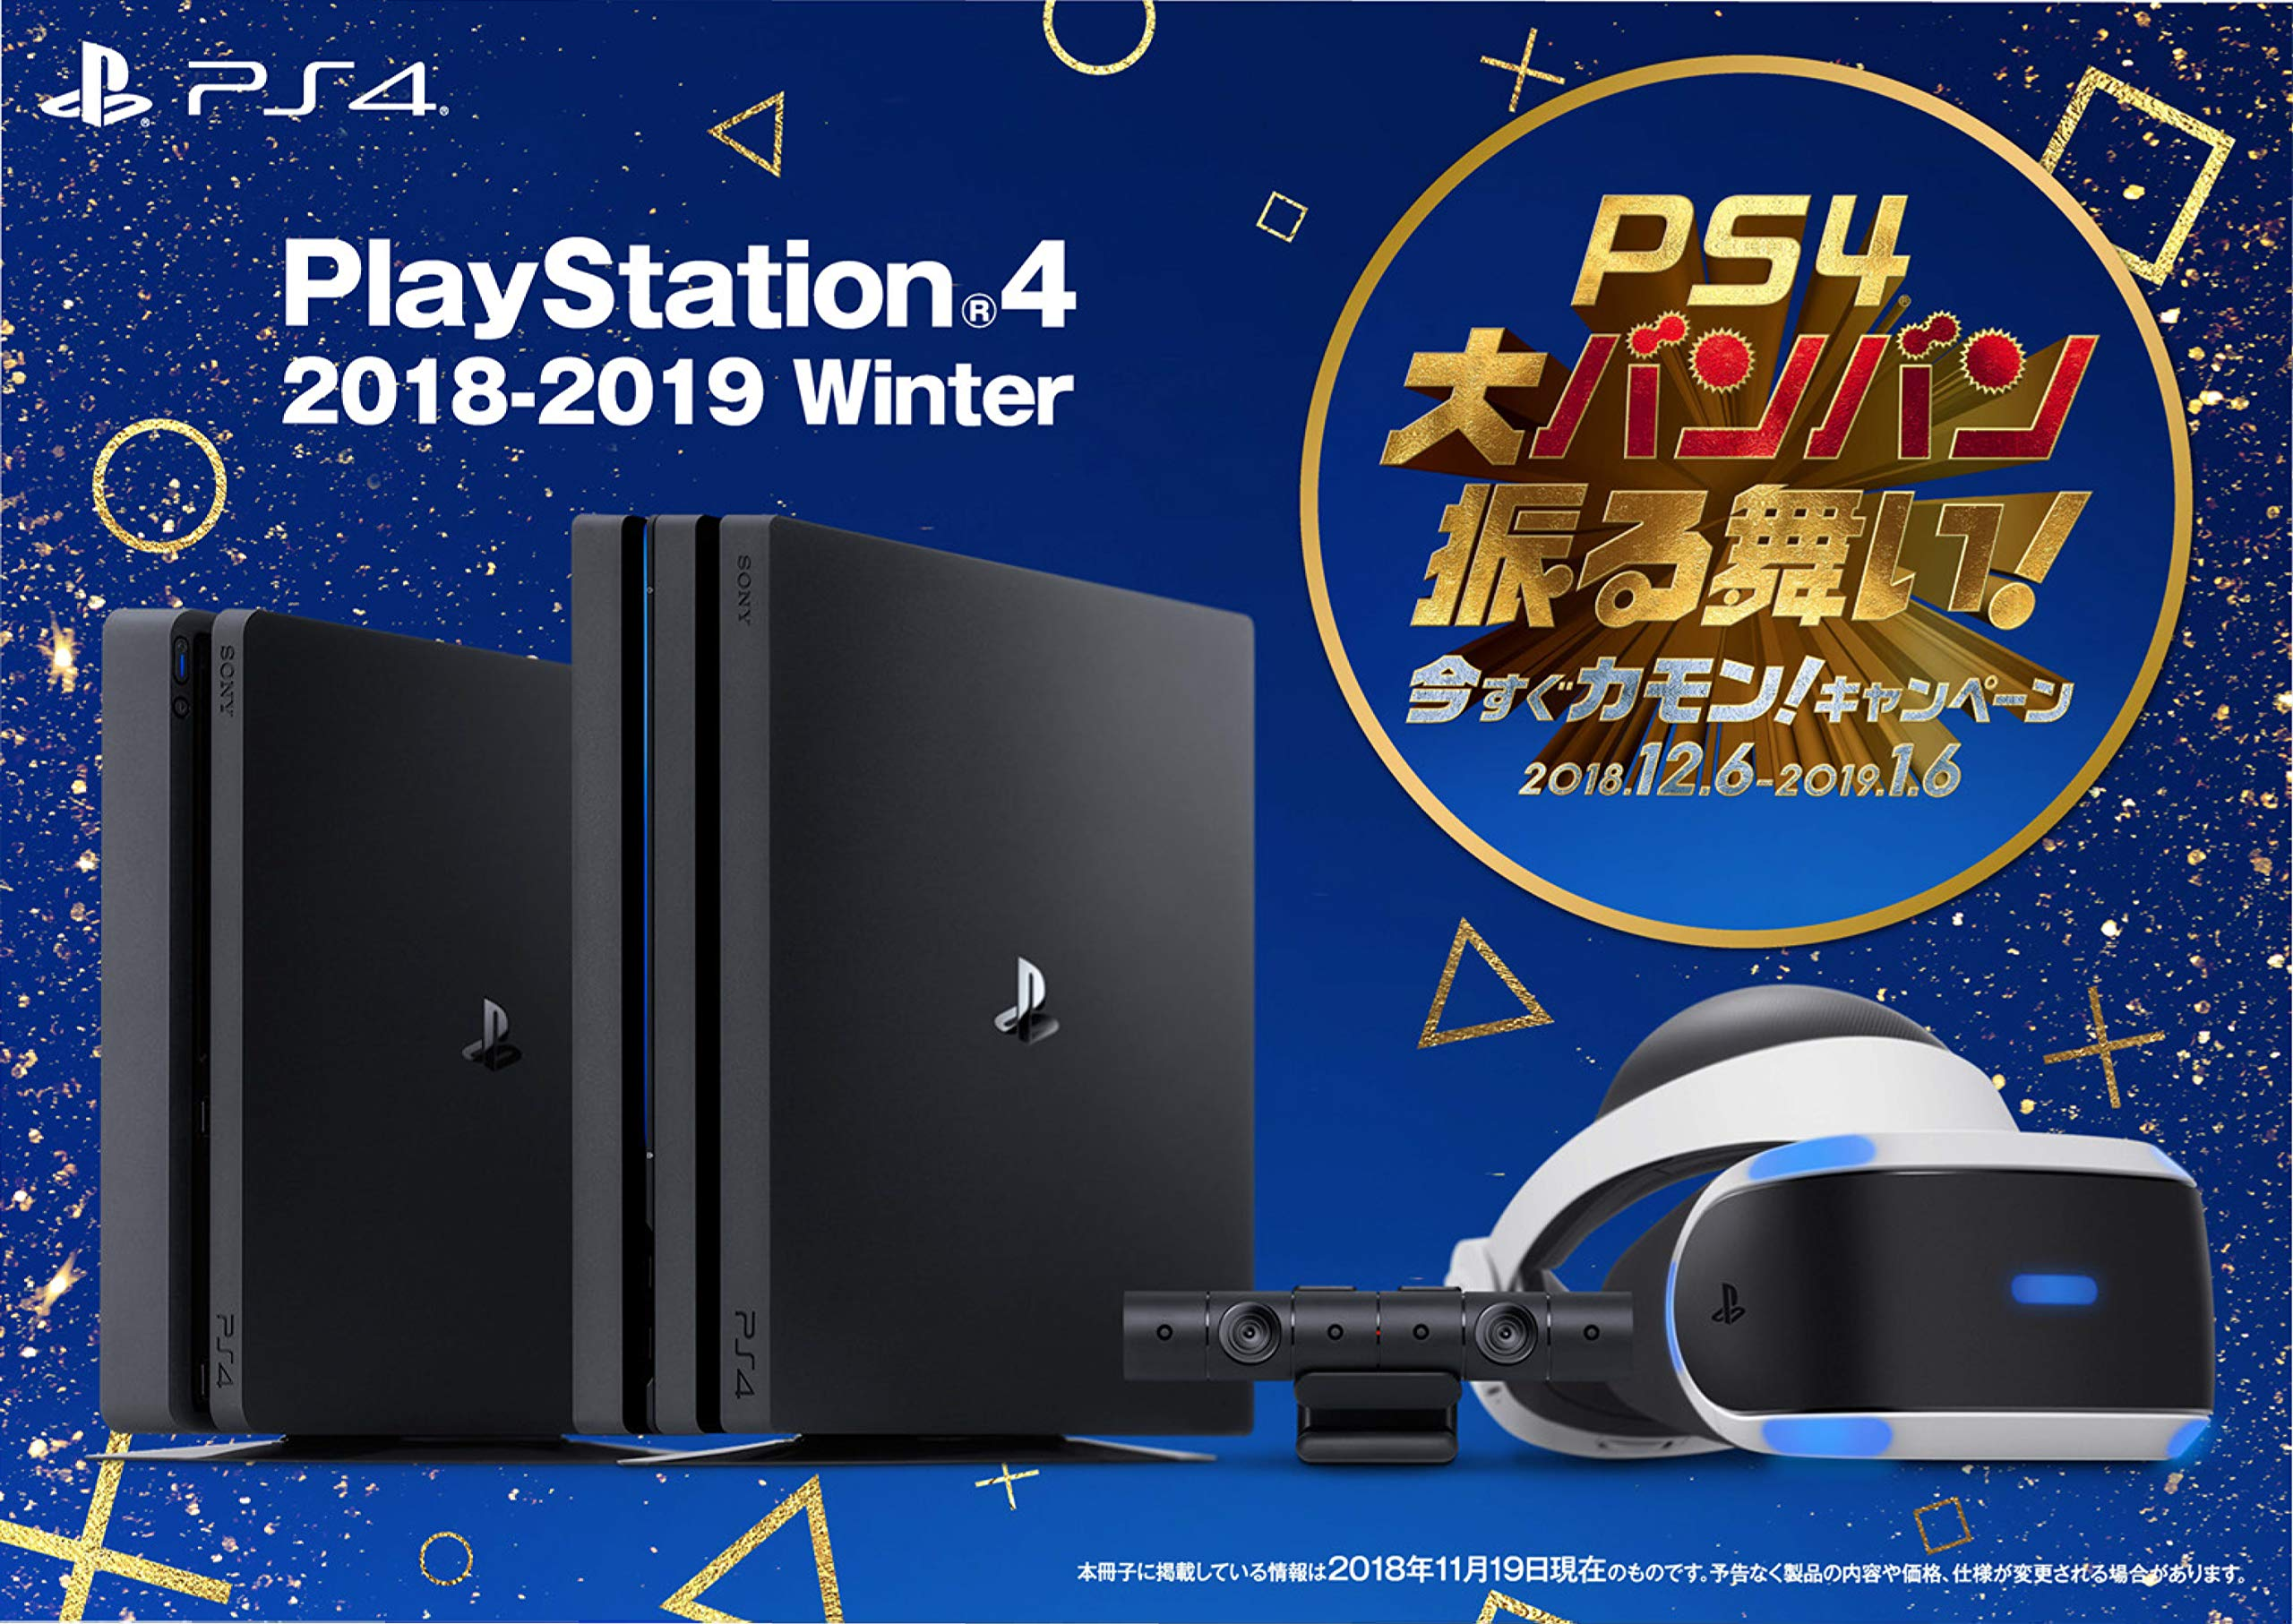 PlayStation 4 Catalog